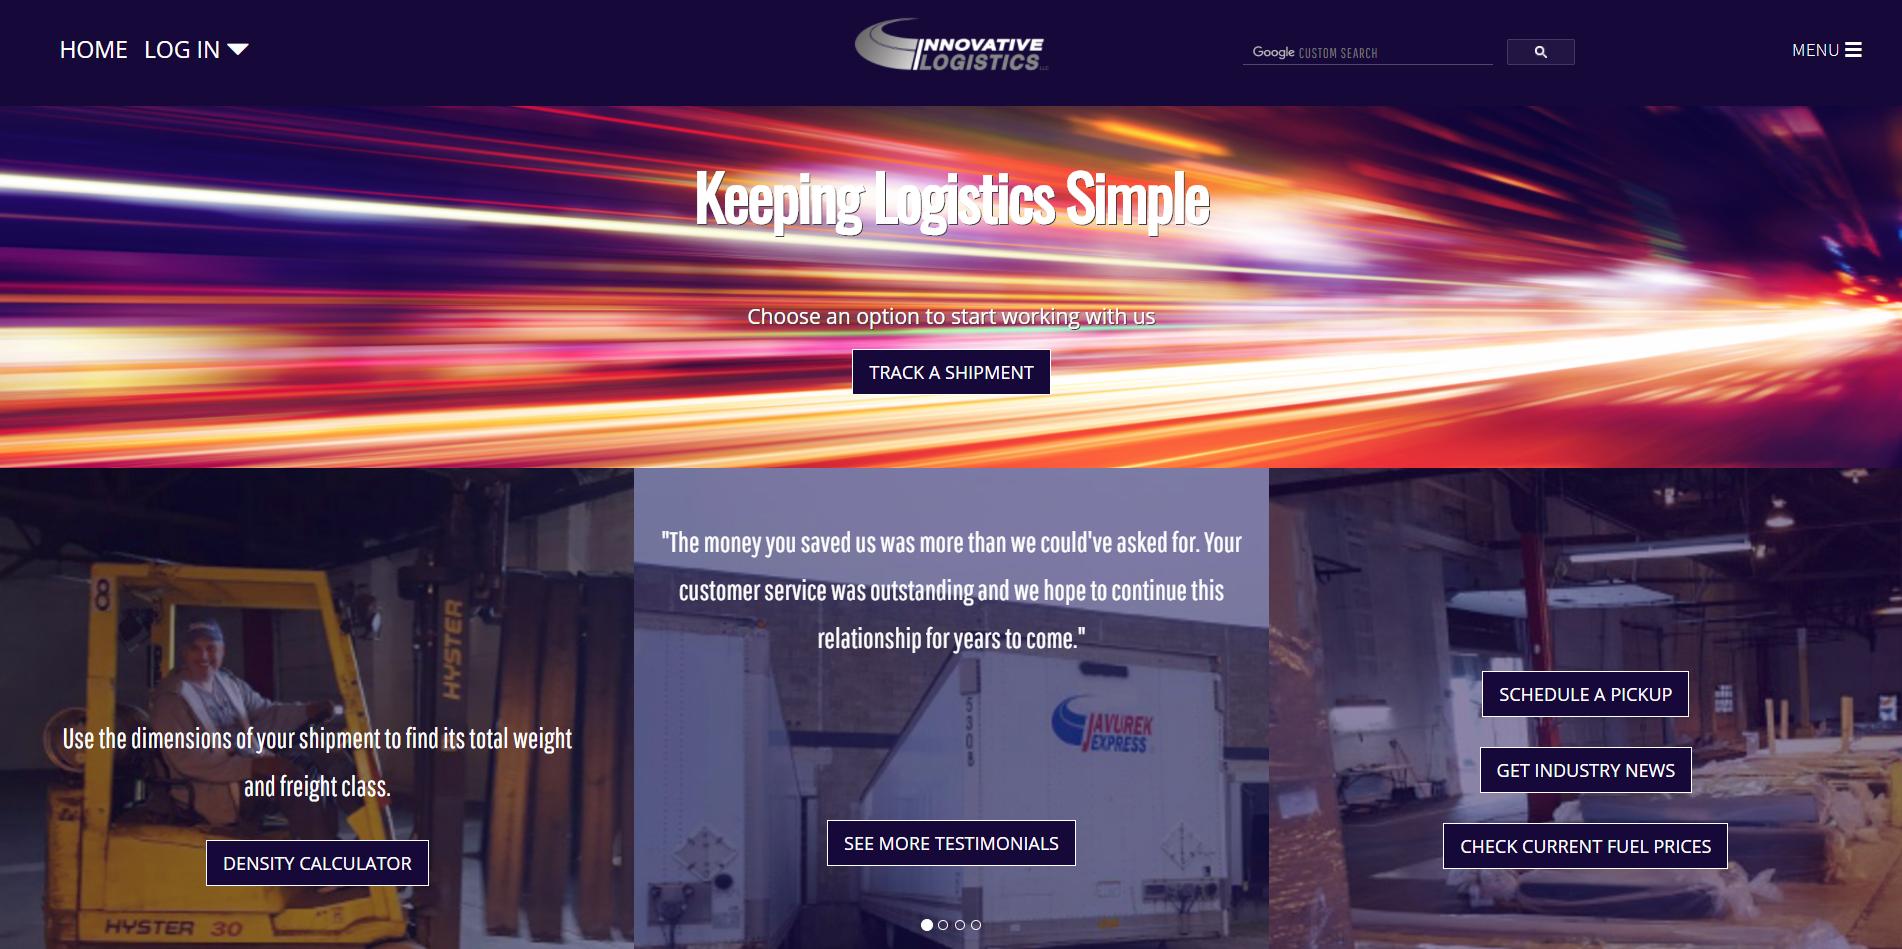 Innovative Logistics, LLC